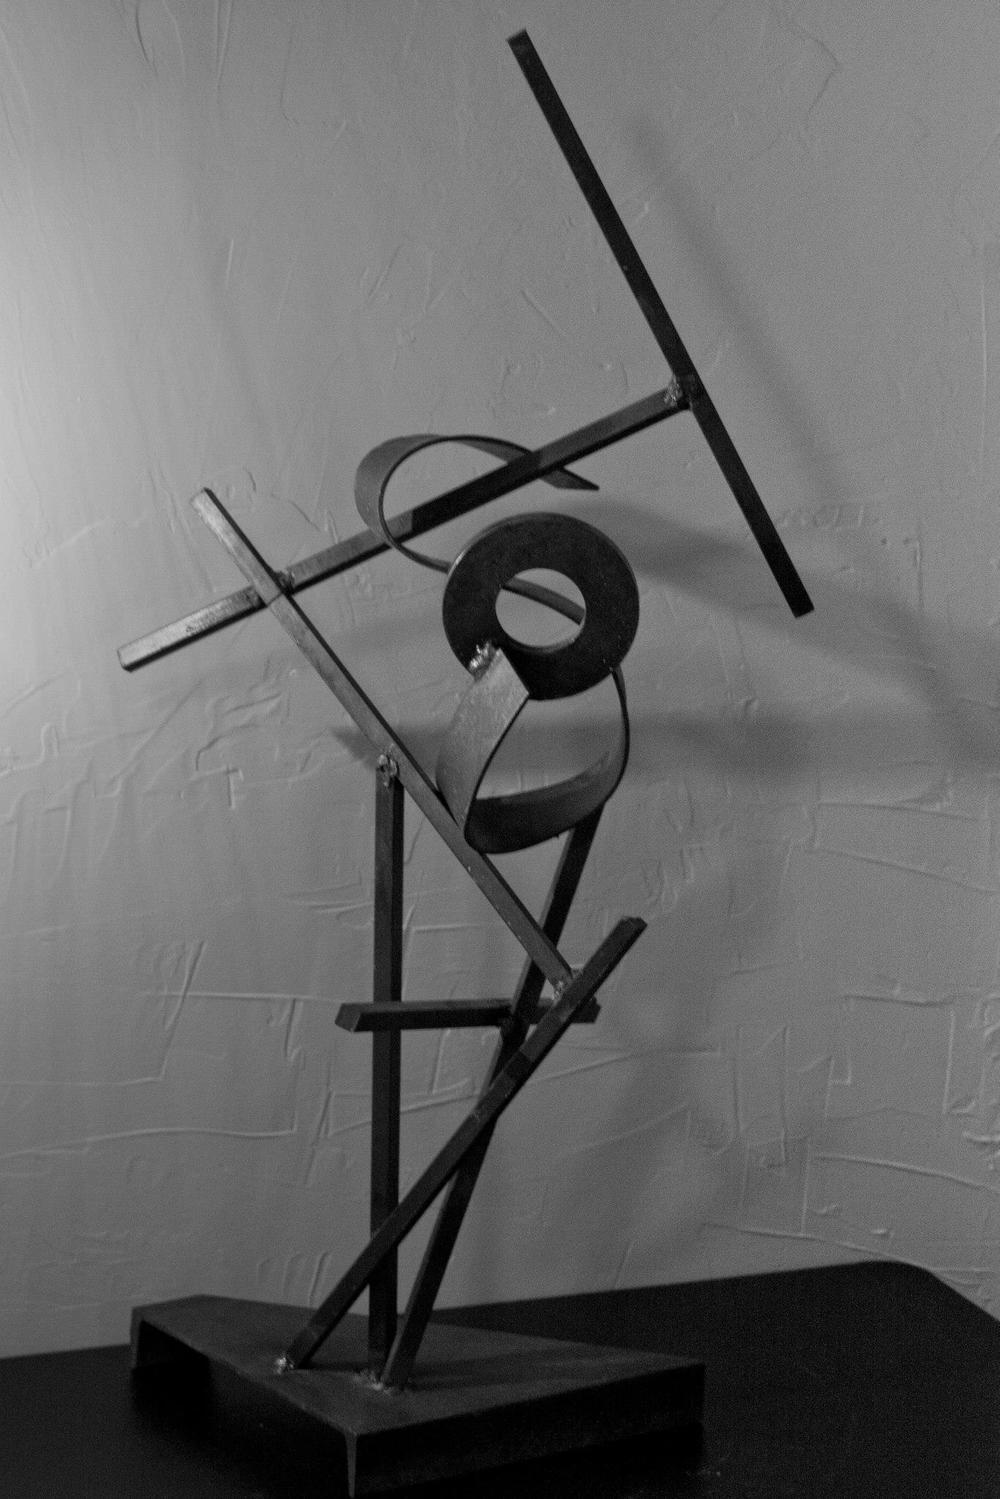 Simplicity II, 2012